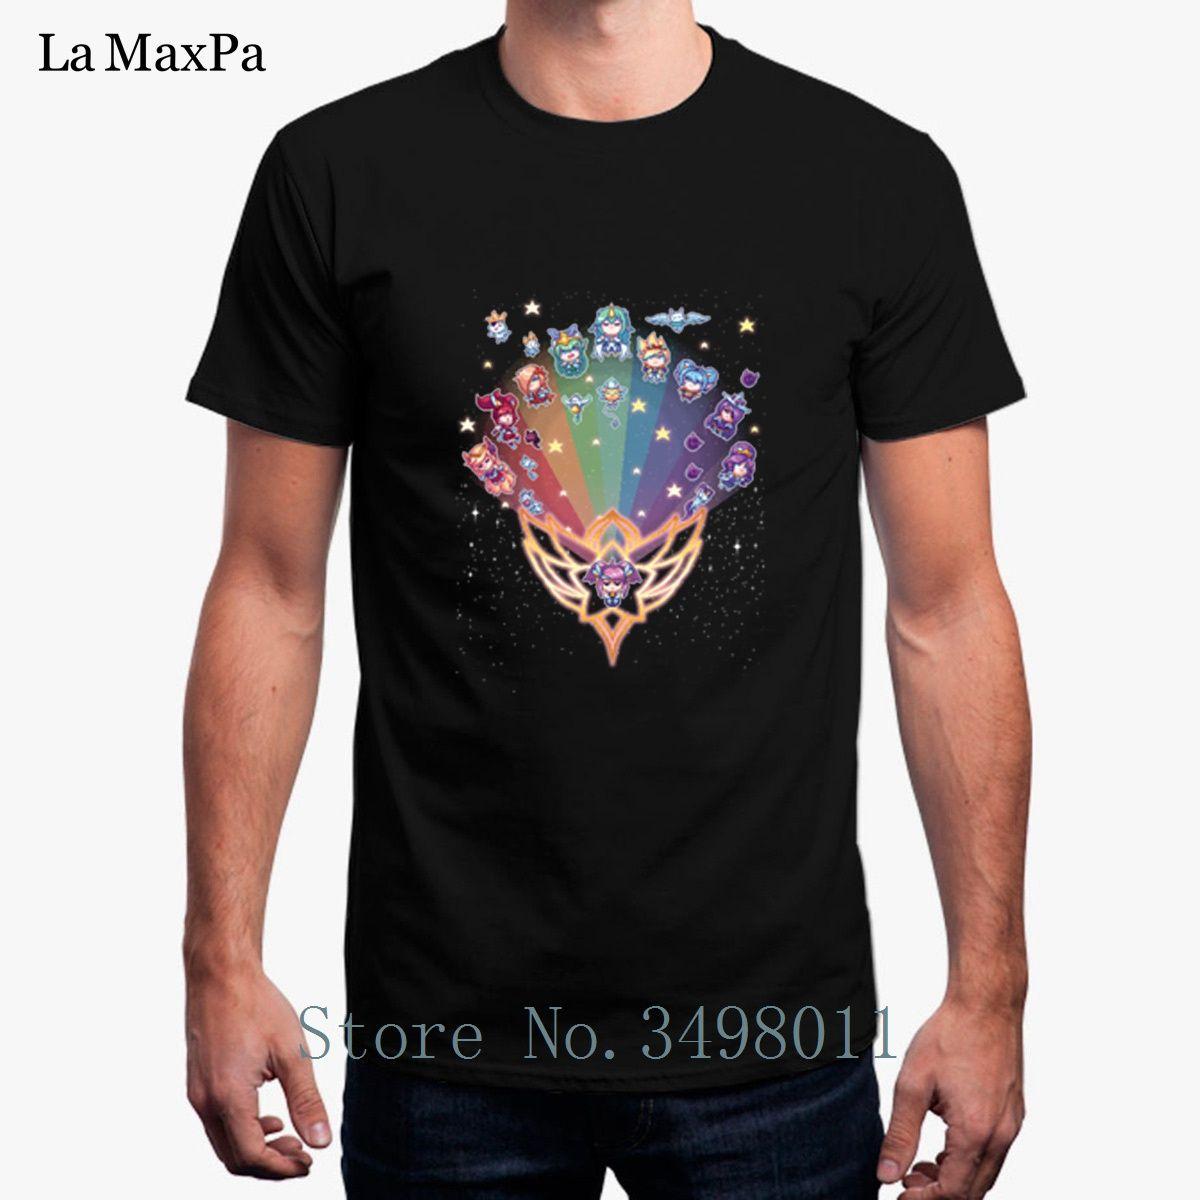 d6228c05e Funny Casual Pixel Star Guardian T Shirt Cool Round Collar Tee Shirt Unisex  Big Sizes T Shirt Men 2018 Homme Hip Hop Long Sleeve Tee Shirts Design Your  Own ...